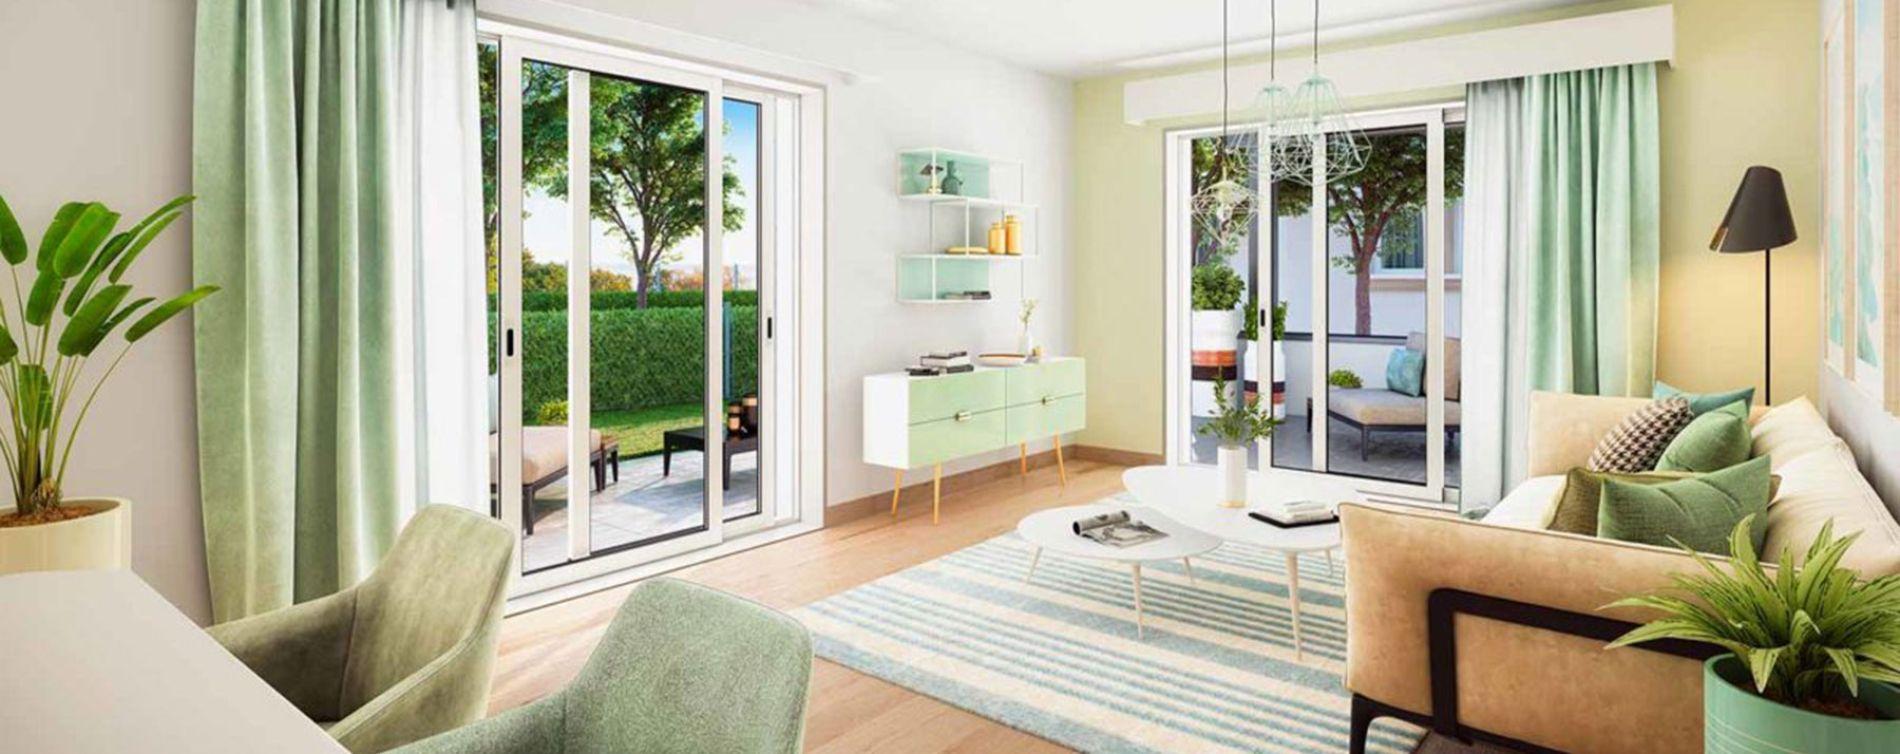 Soorts-Hossegor : programme immobilier neuve « Programme immobilier n°219043 » en Loi Pinel (5)